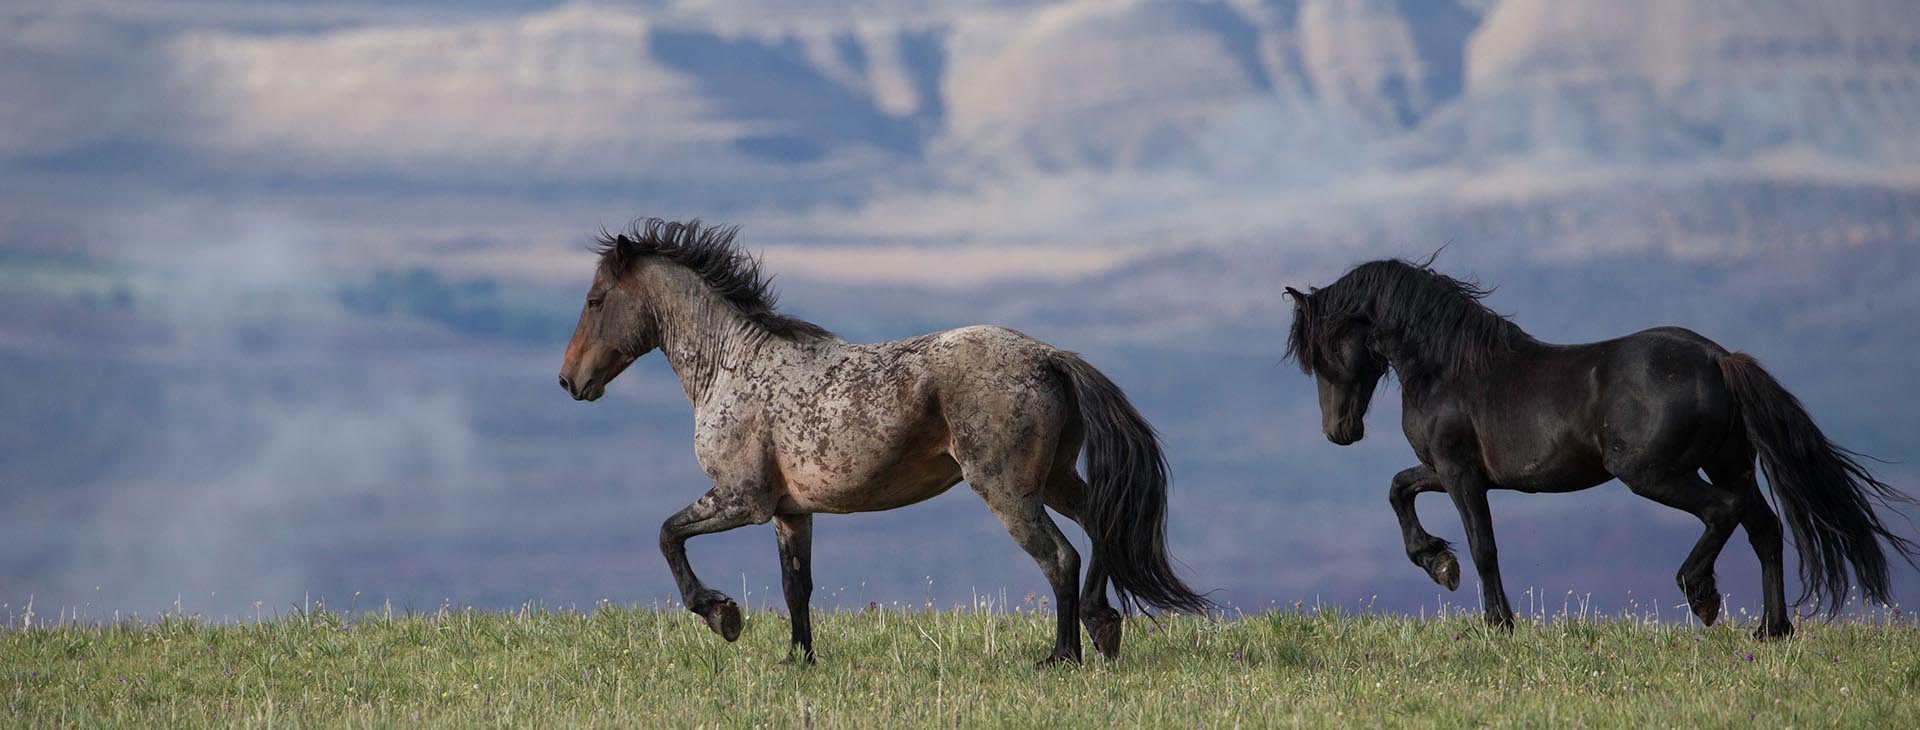 wild horse and horse fine art prints by carol j walker horse